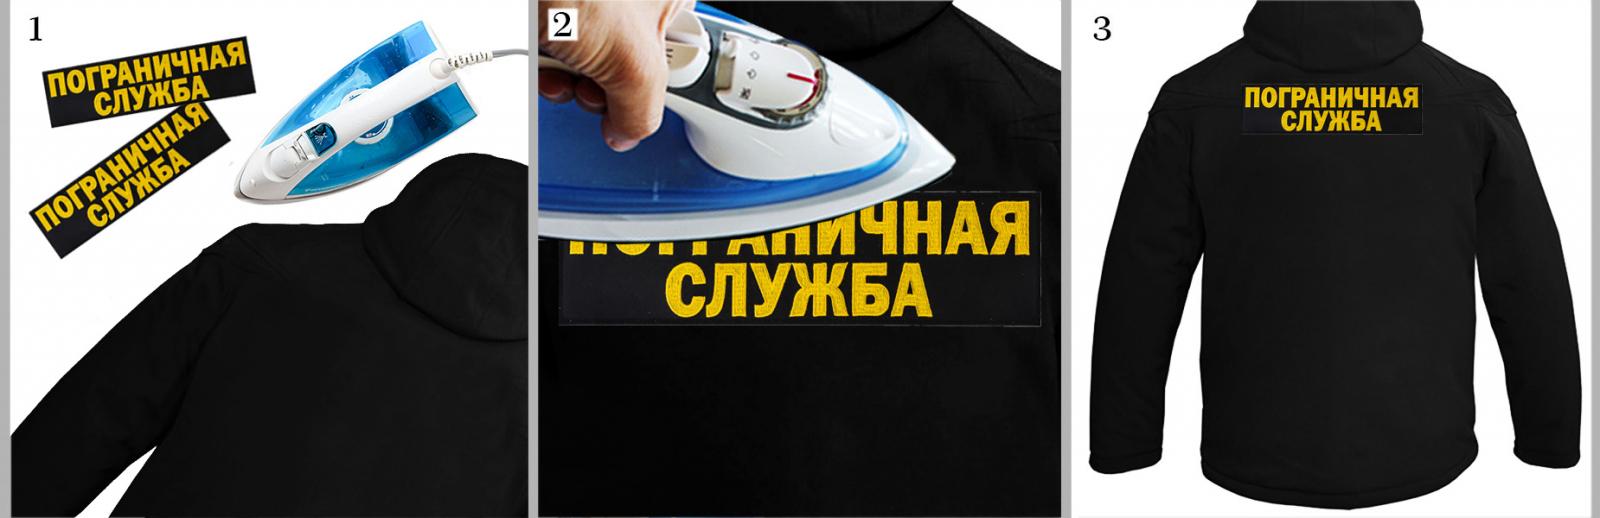 "Термонашивка ""Пограничная служба"" на куртке"